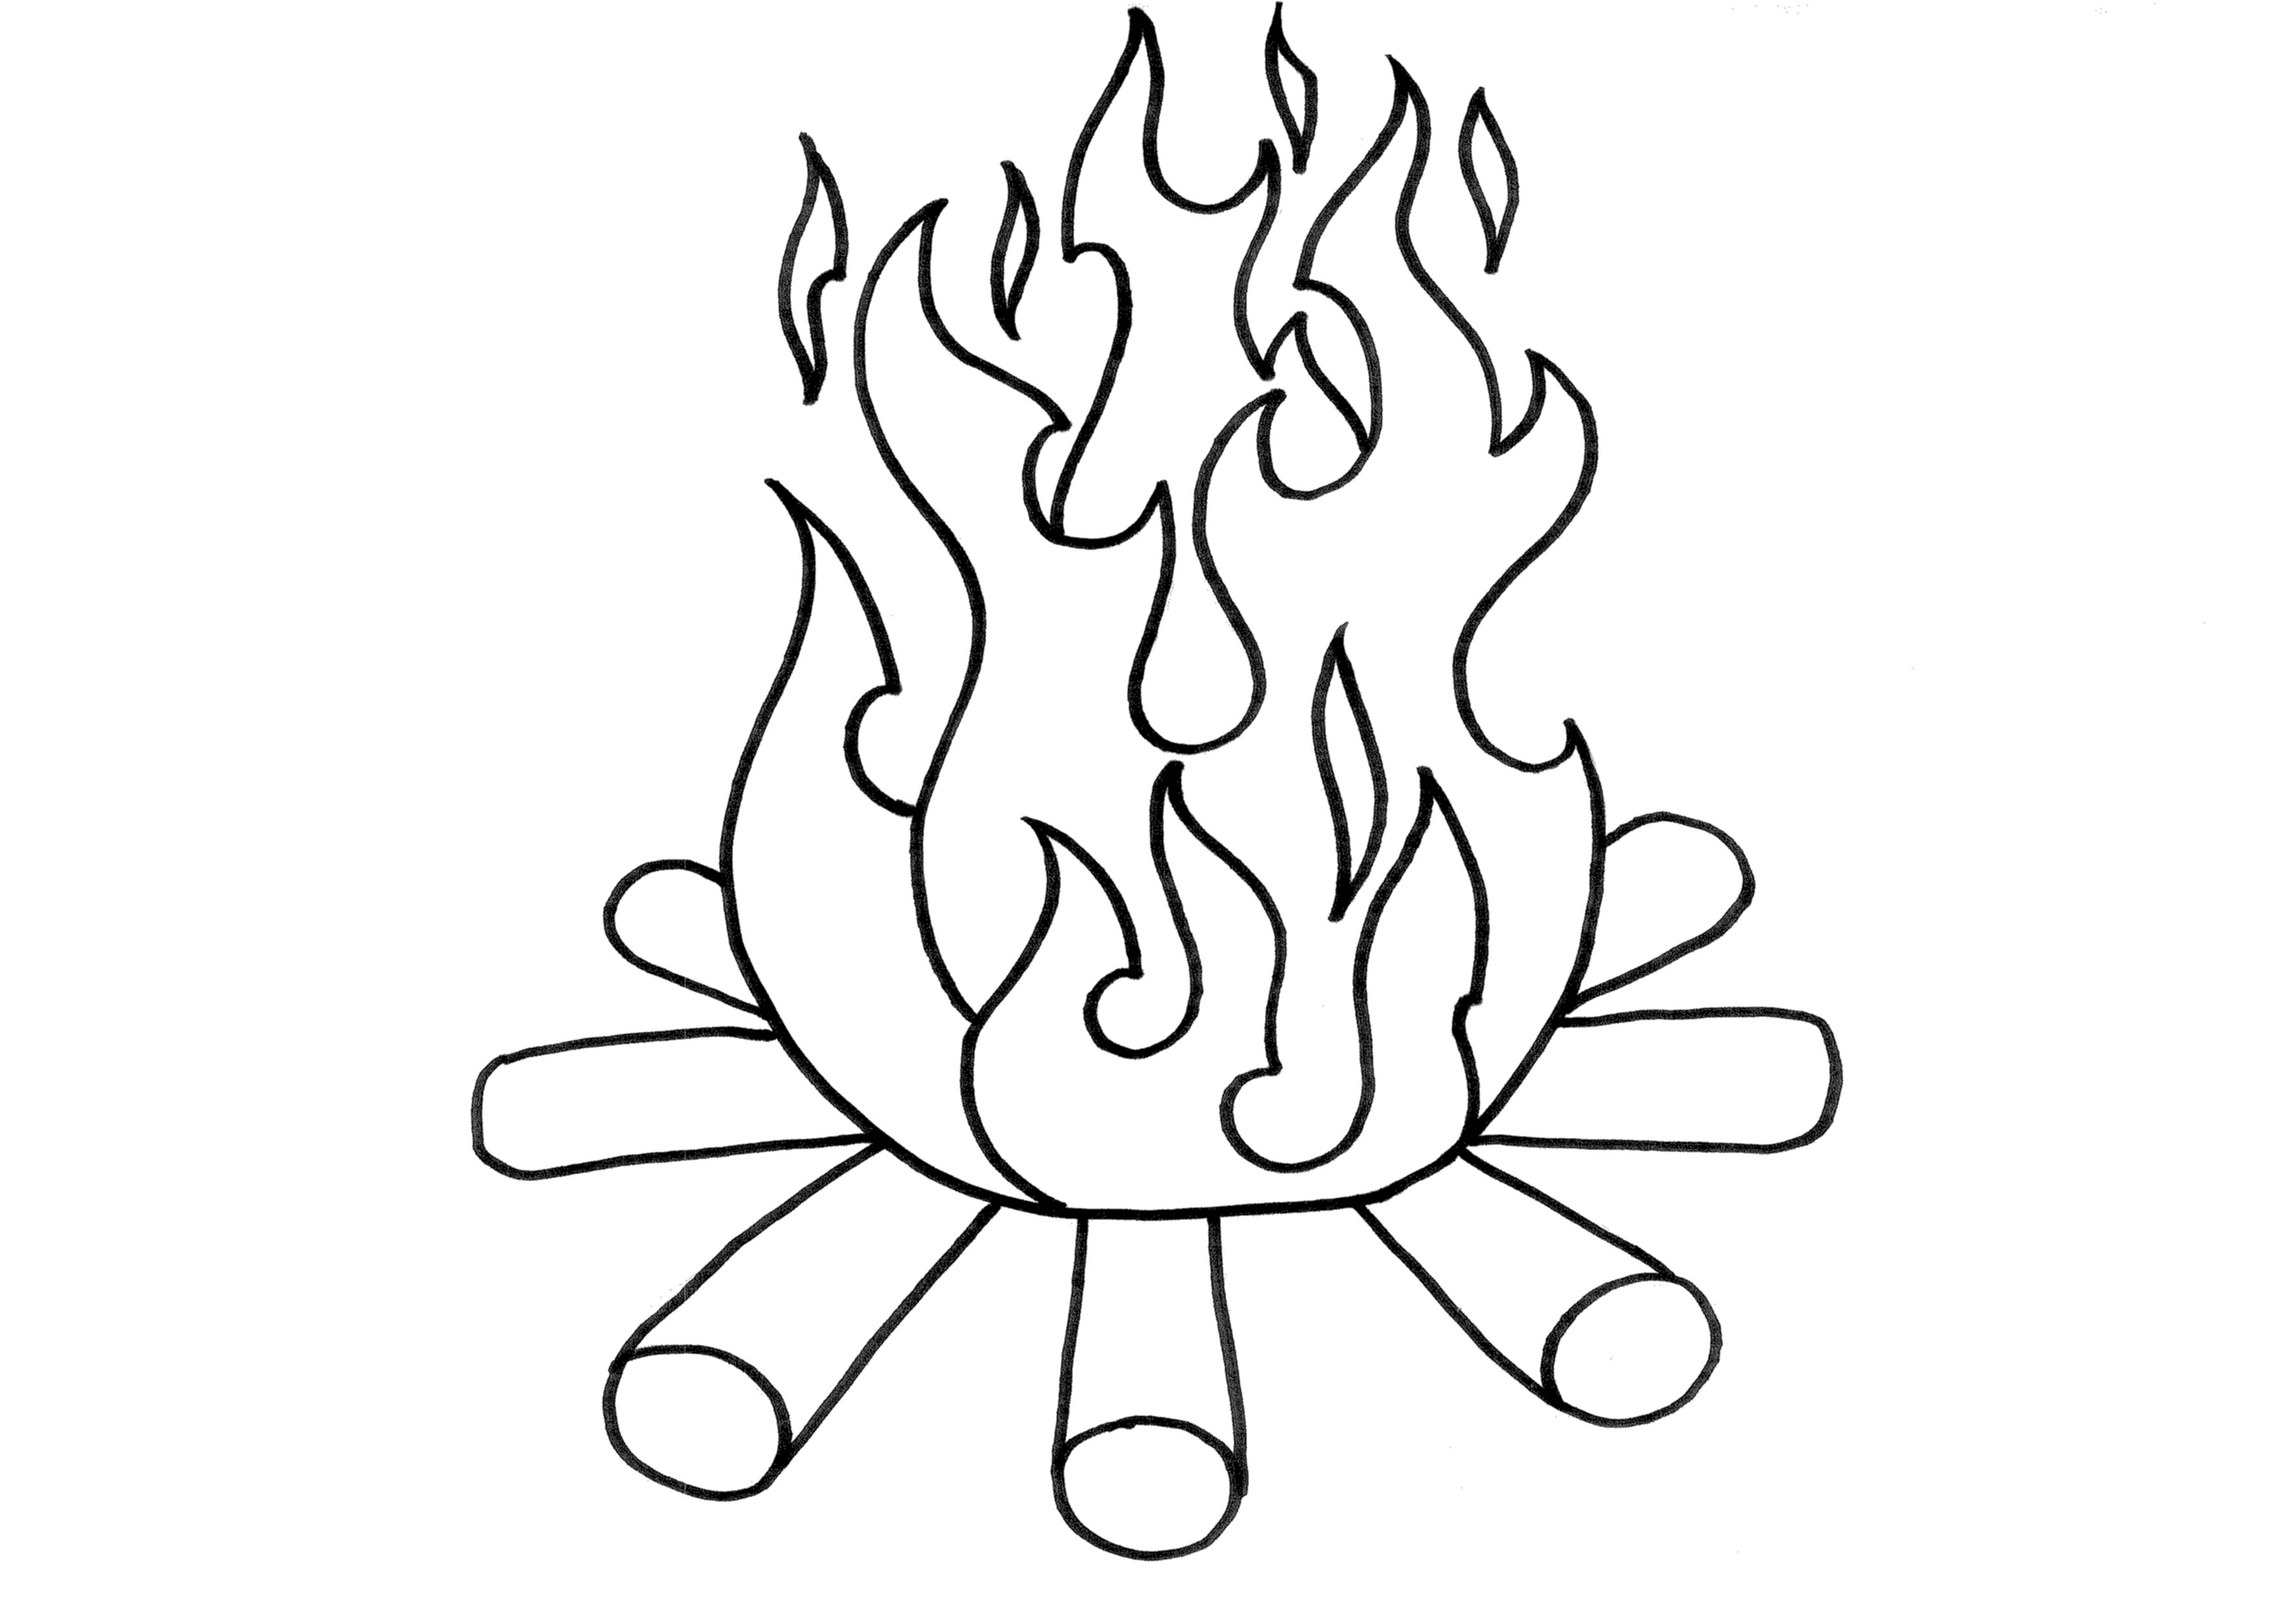 Flame Line Drawing At Getdrawings